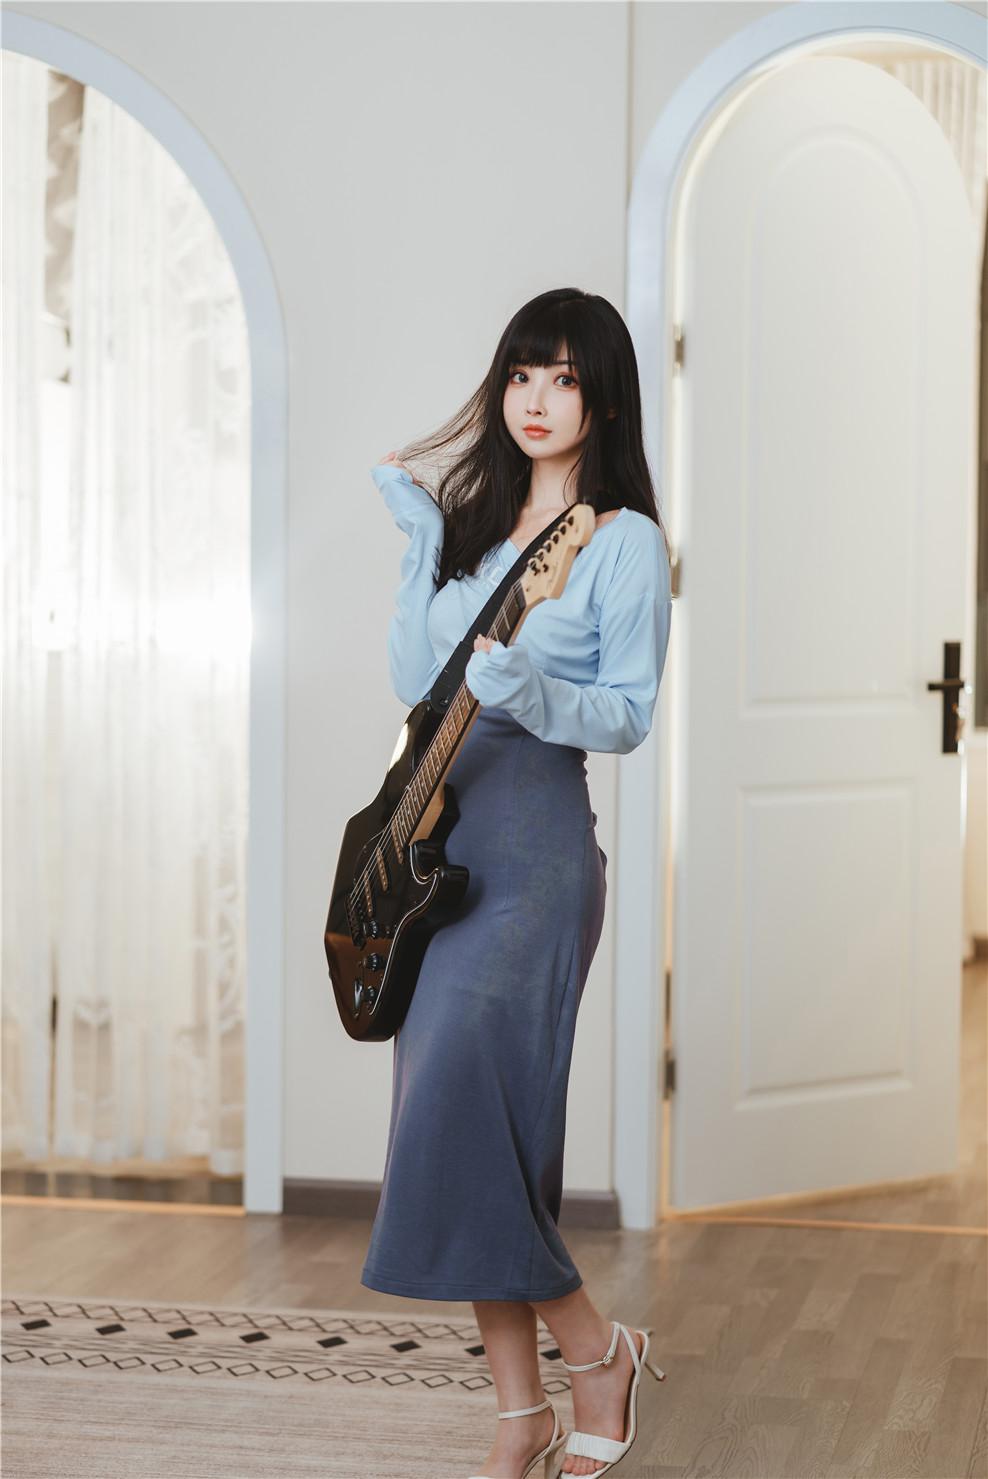 rioko凉凉子——吉他妹妹系带裙[45P+1V-1.24 GB]